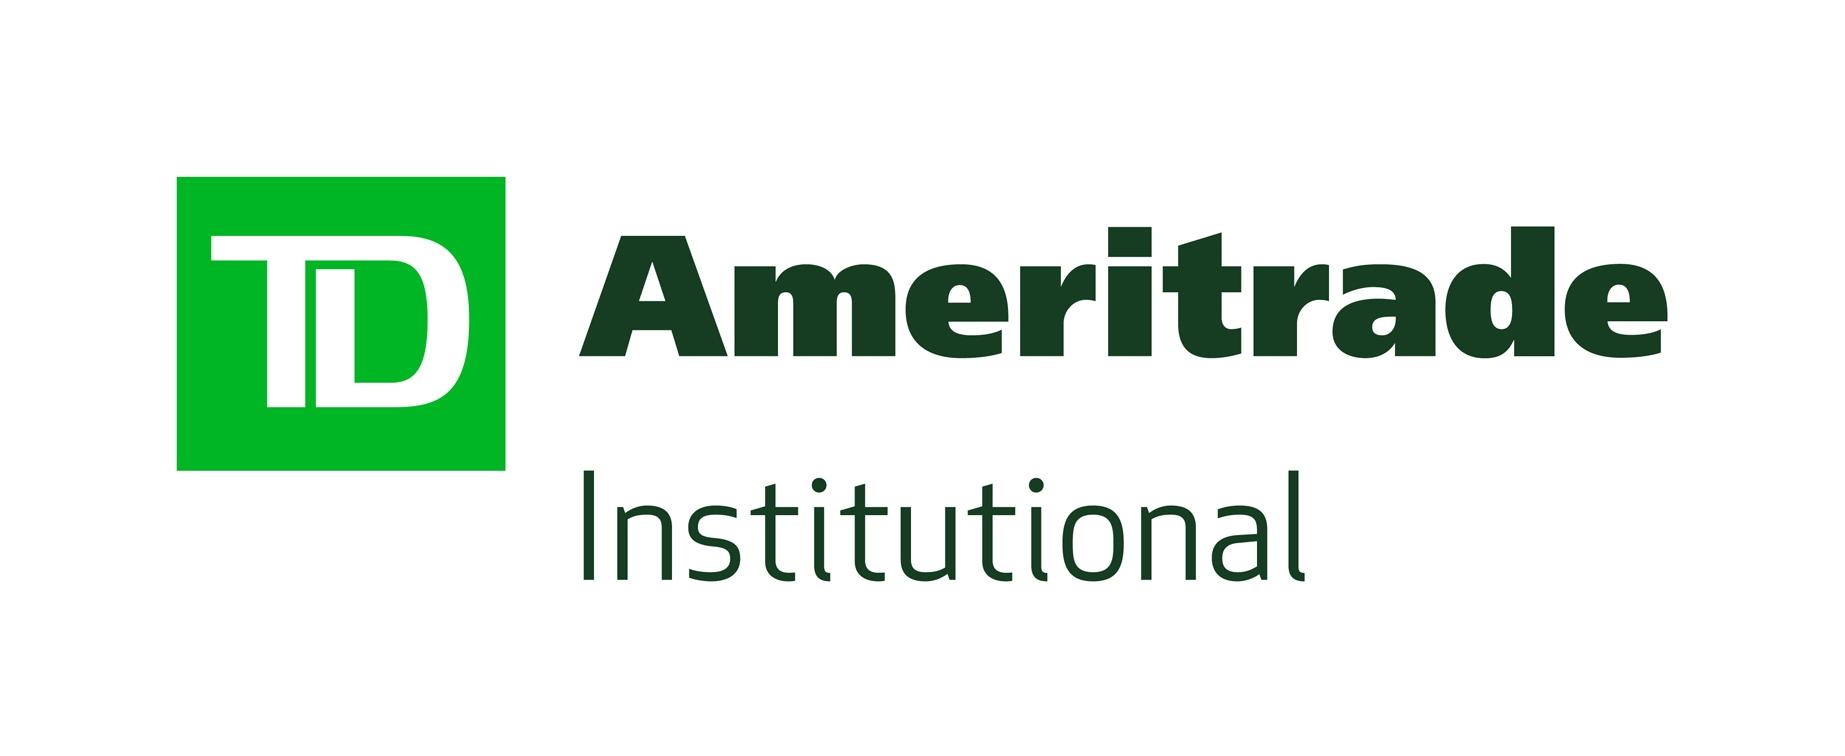 TD Ameritrade Institutional Eagle, ID Enduro Financial